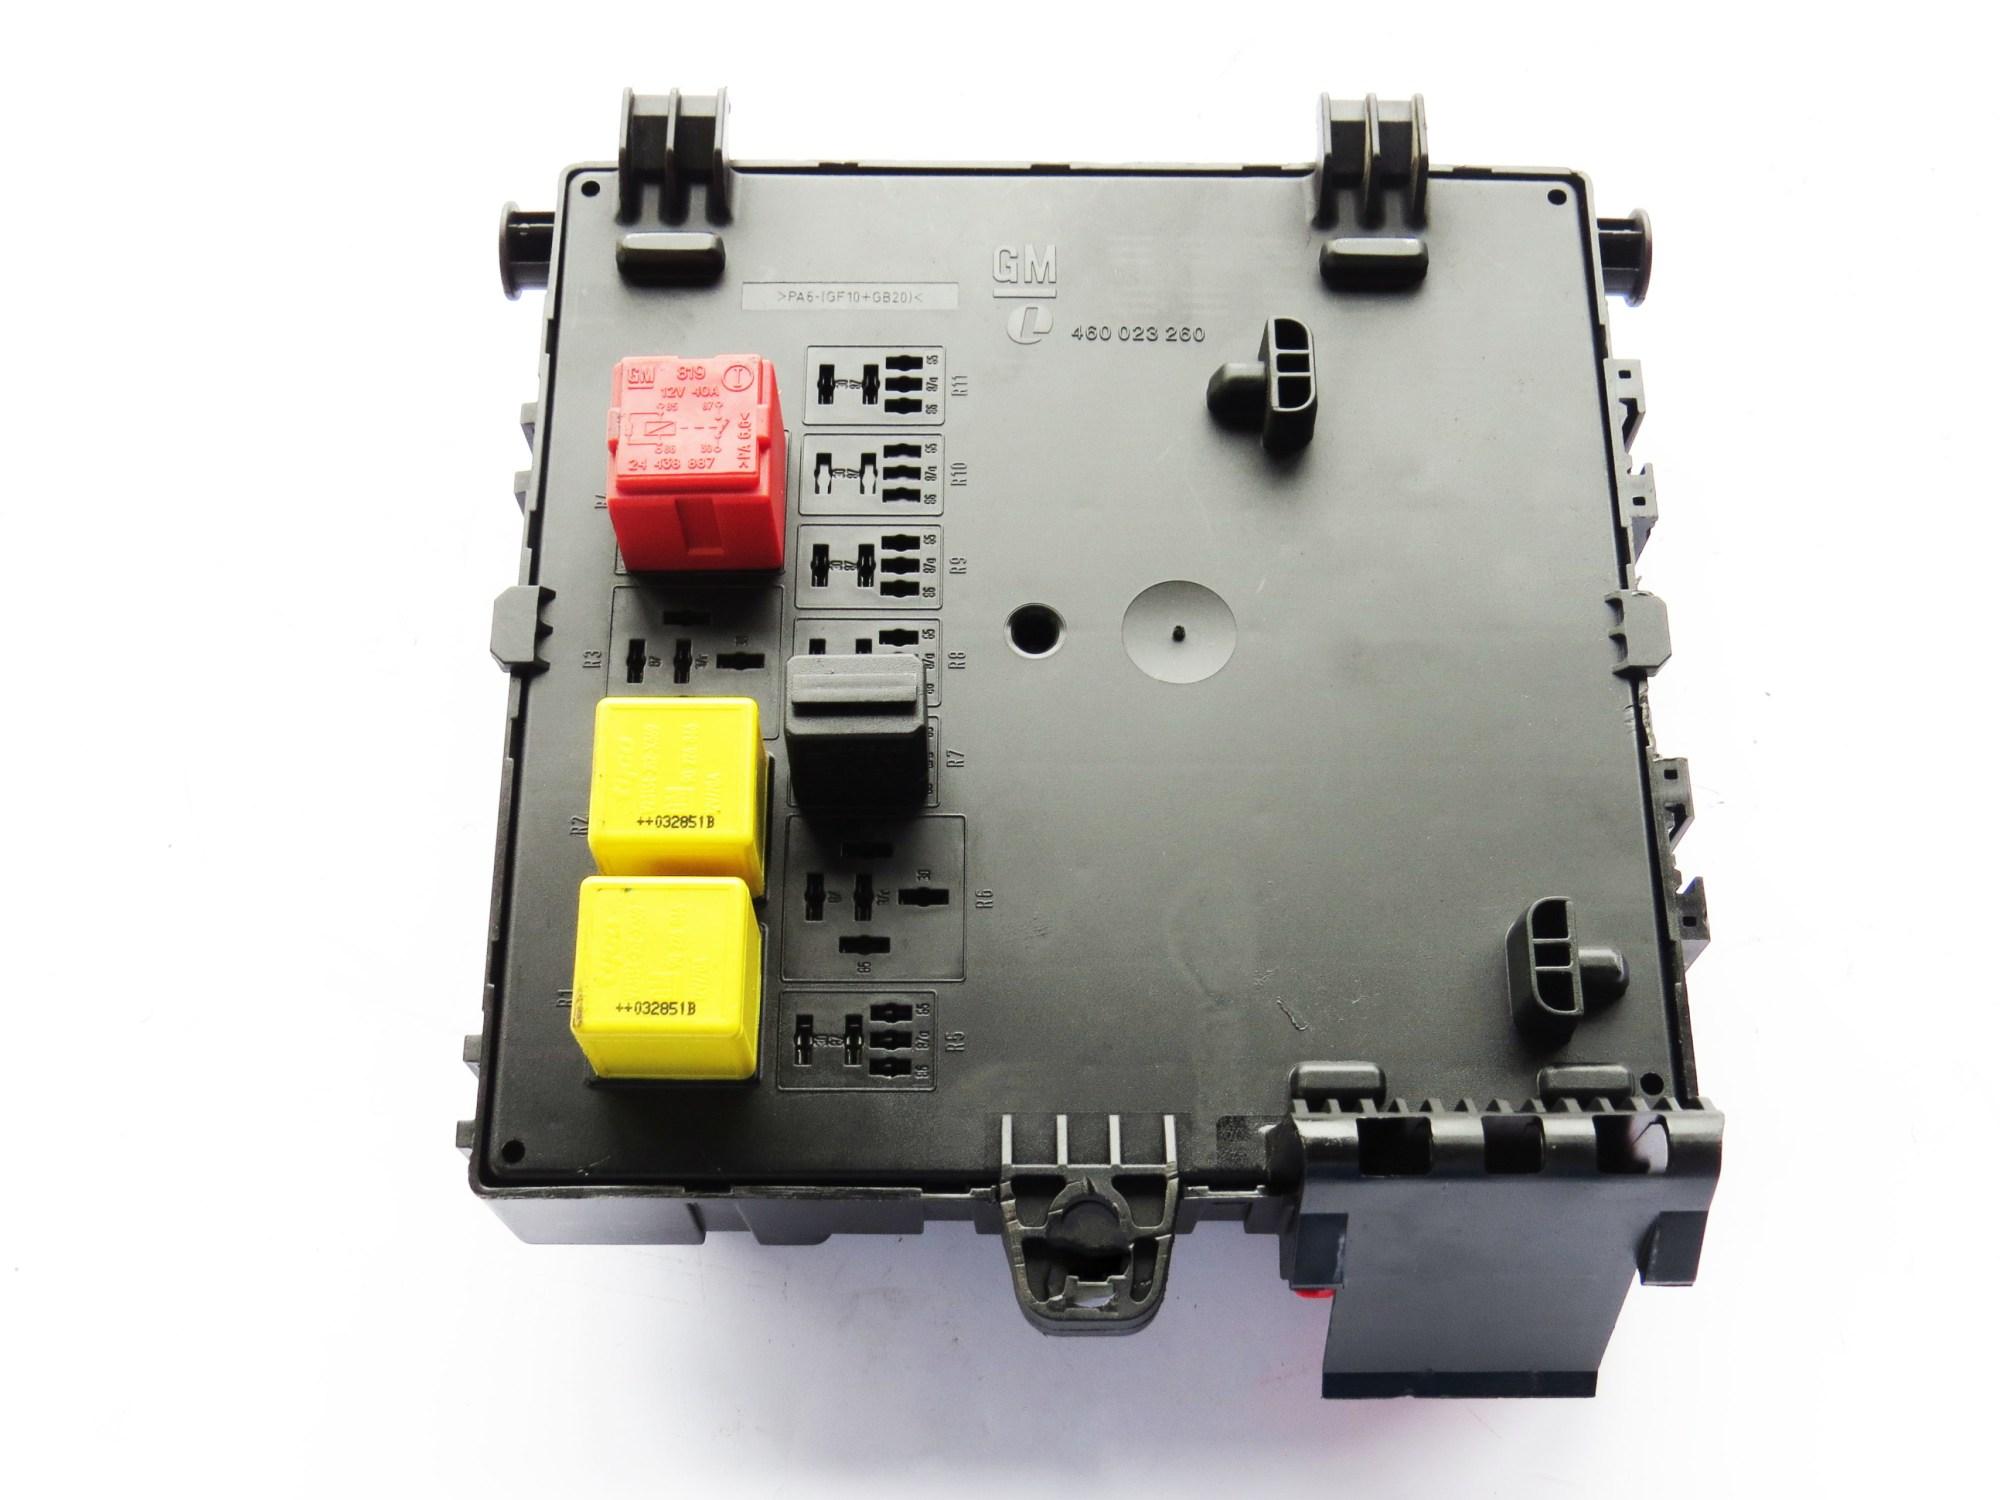 hight resolution of saab 9 3 2006 oem trunk body control fuse box 12801000 460023260